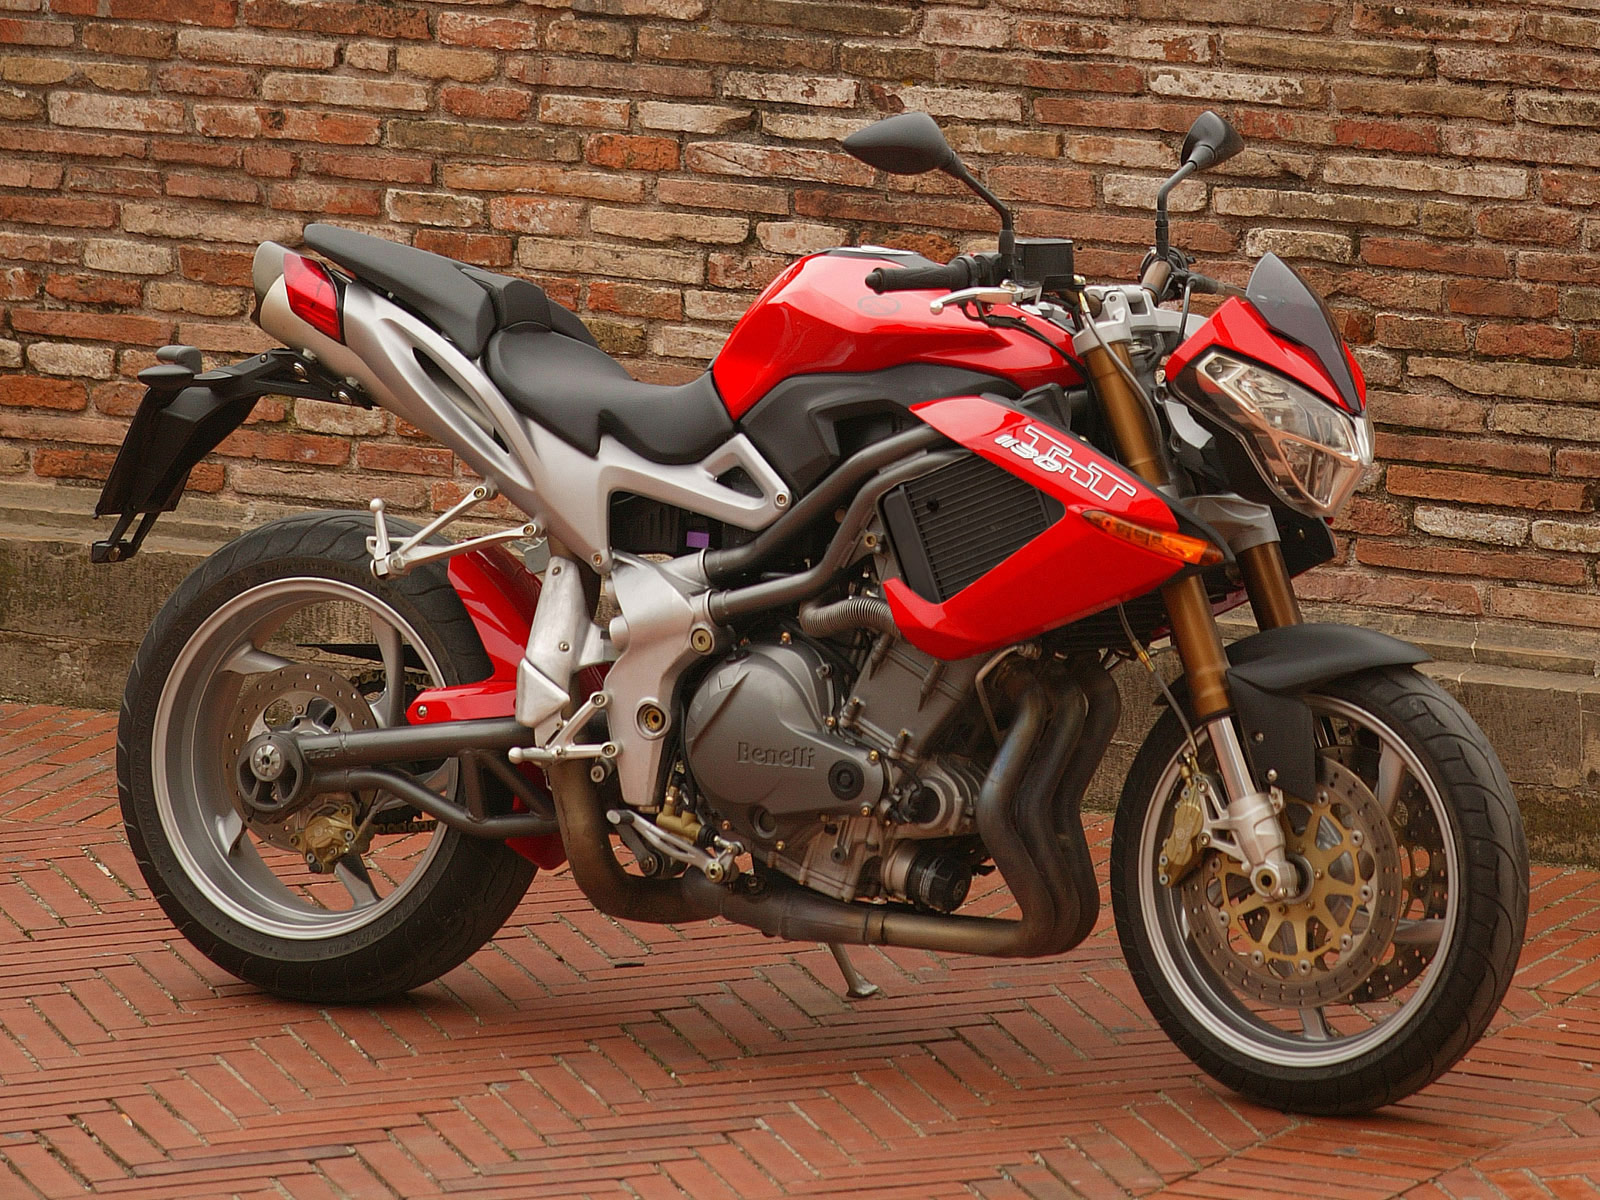 http://2.bp.blogspot.com/-H3EhGiv1iUY/Tr29MtGo15I/AAAAAAAADyg/fIvXo9lYzOQ/s1600/2005_Benelli-TNT-1130_motorcycle-desktop-wallpaper_19.jpg